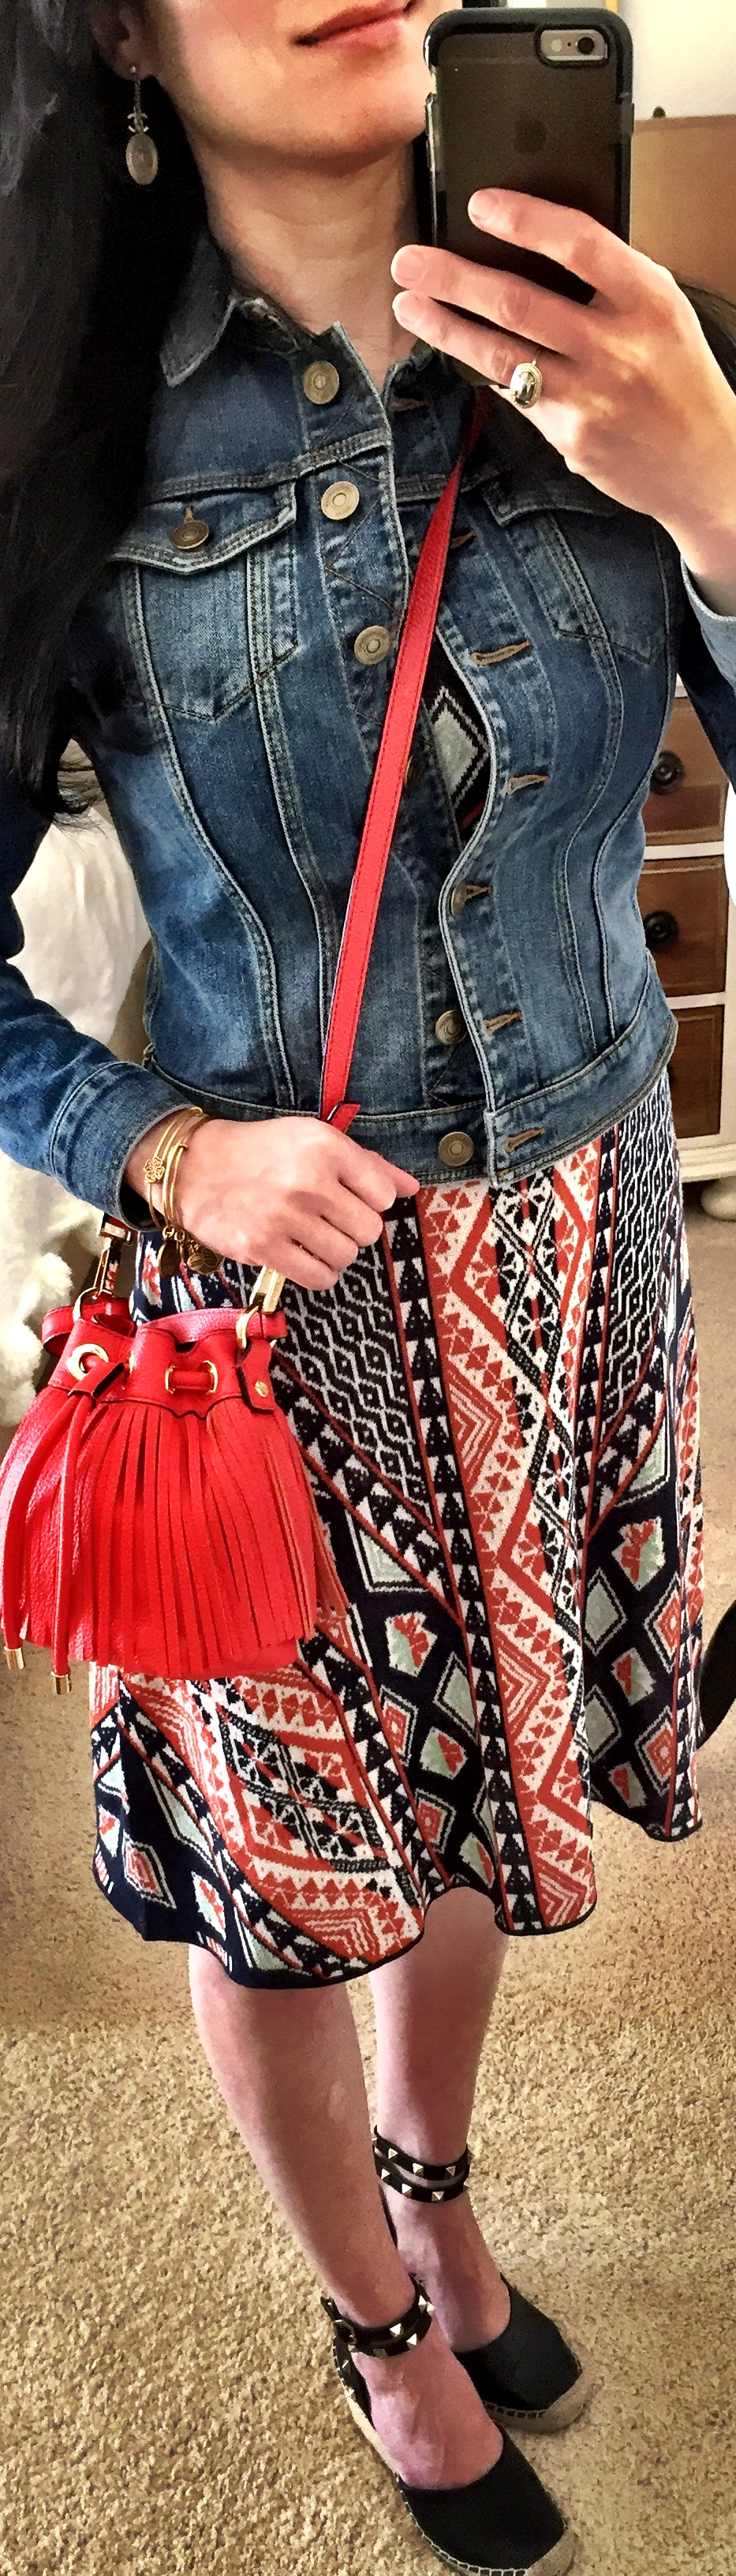 April 20th, BCBG knit dress with Burberry Brit denim jacket